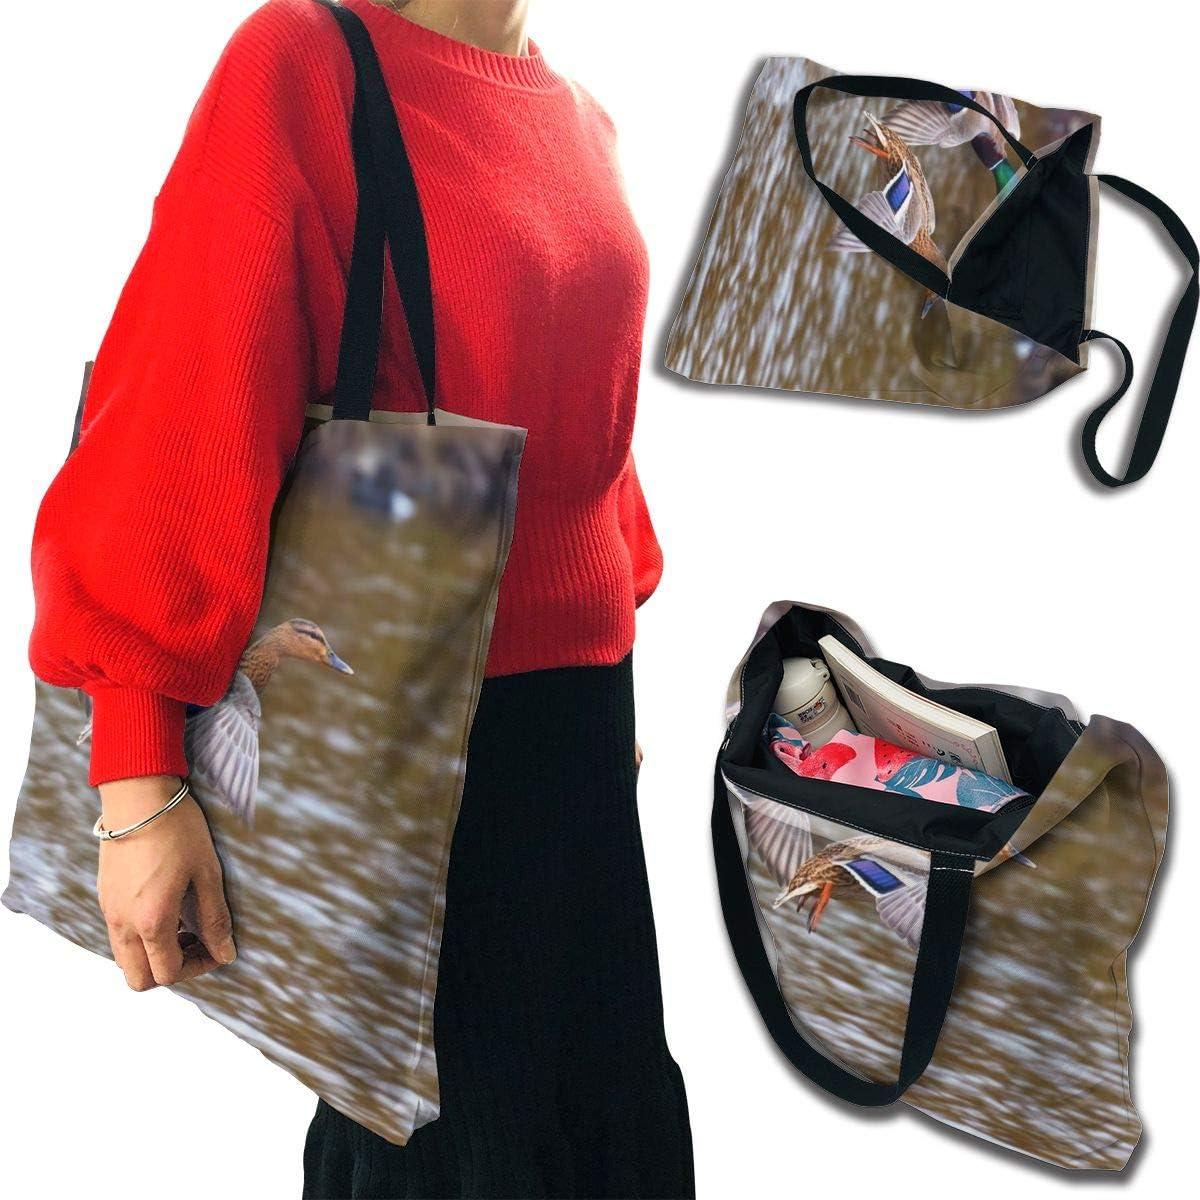 PengMin Duck Bird Landing Fashion Womens Multi-Pocket Vintage Canvas Handbags Miniature Shoulder Bags Totes Purses Shopping Bags